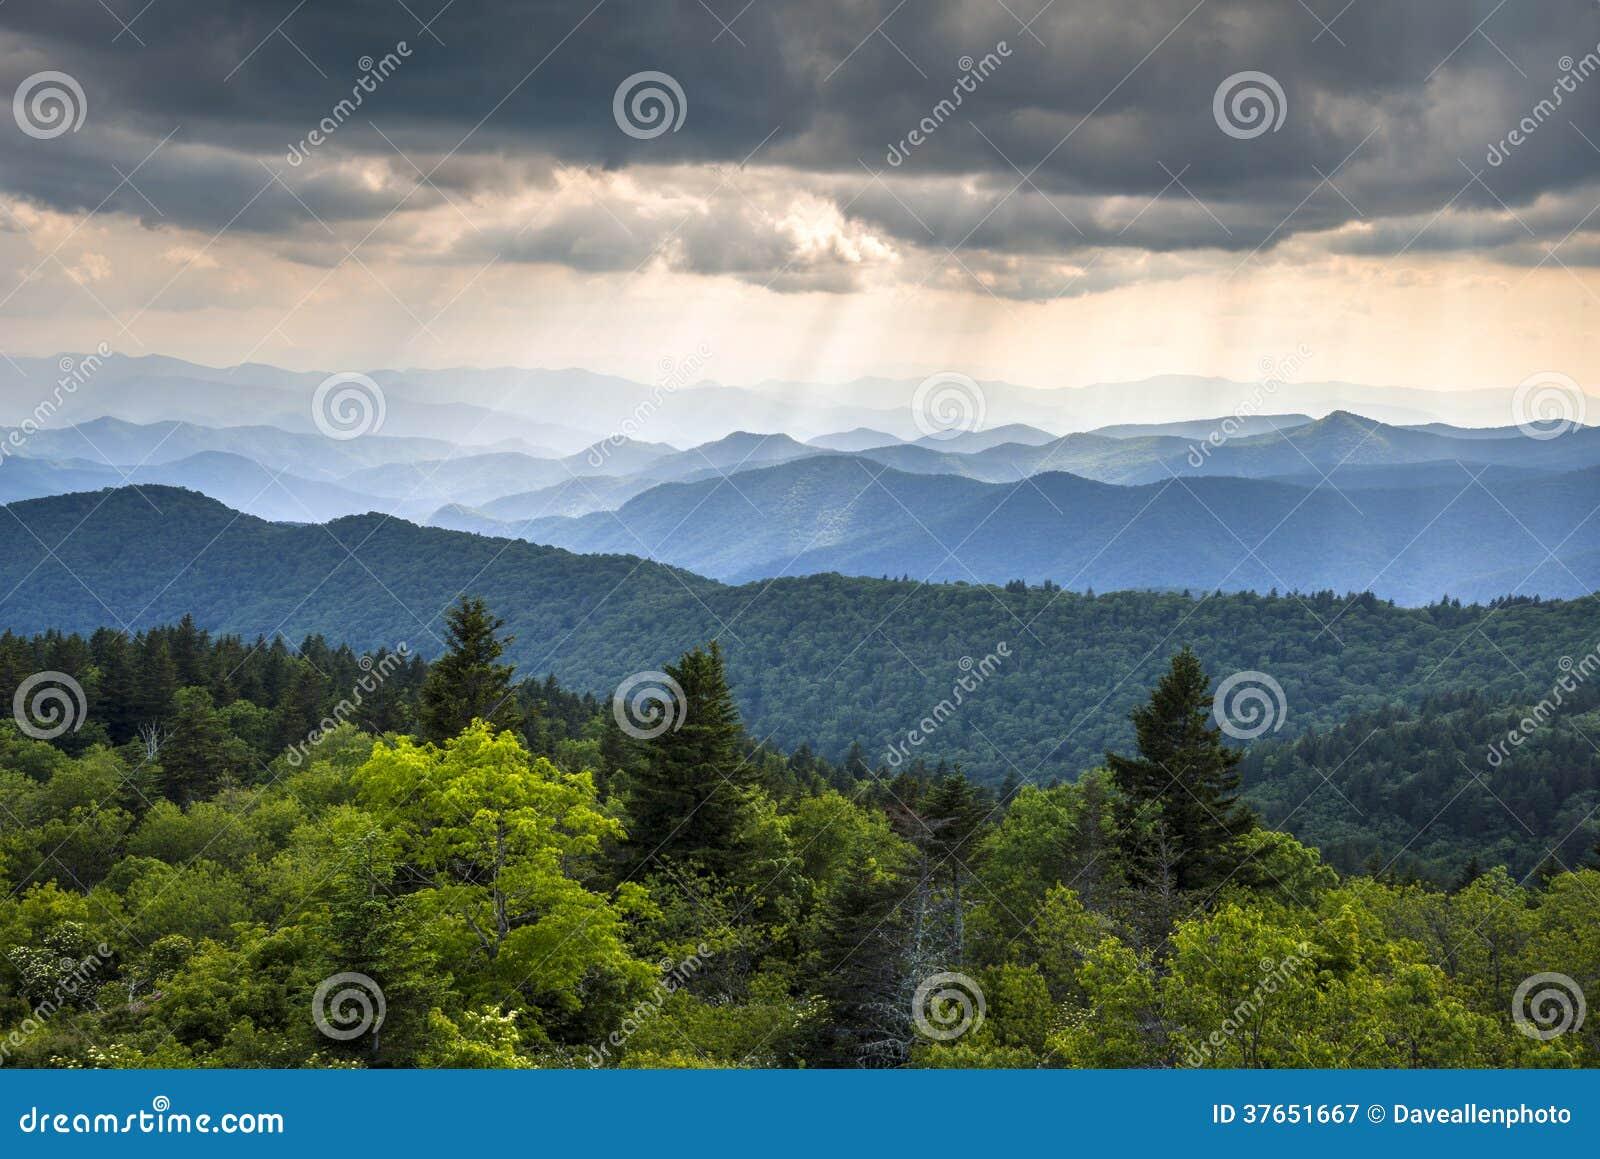 Appalachian Mountains Blue Ridge Parkway Western North